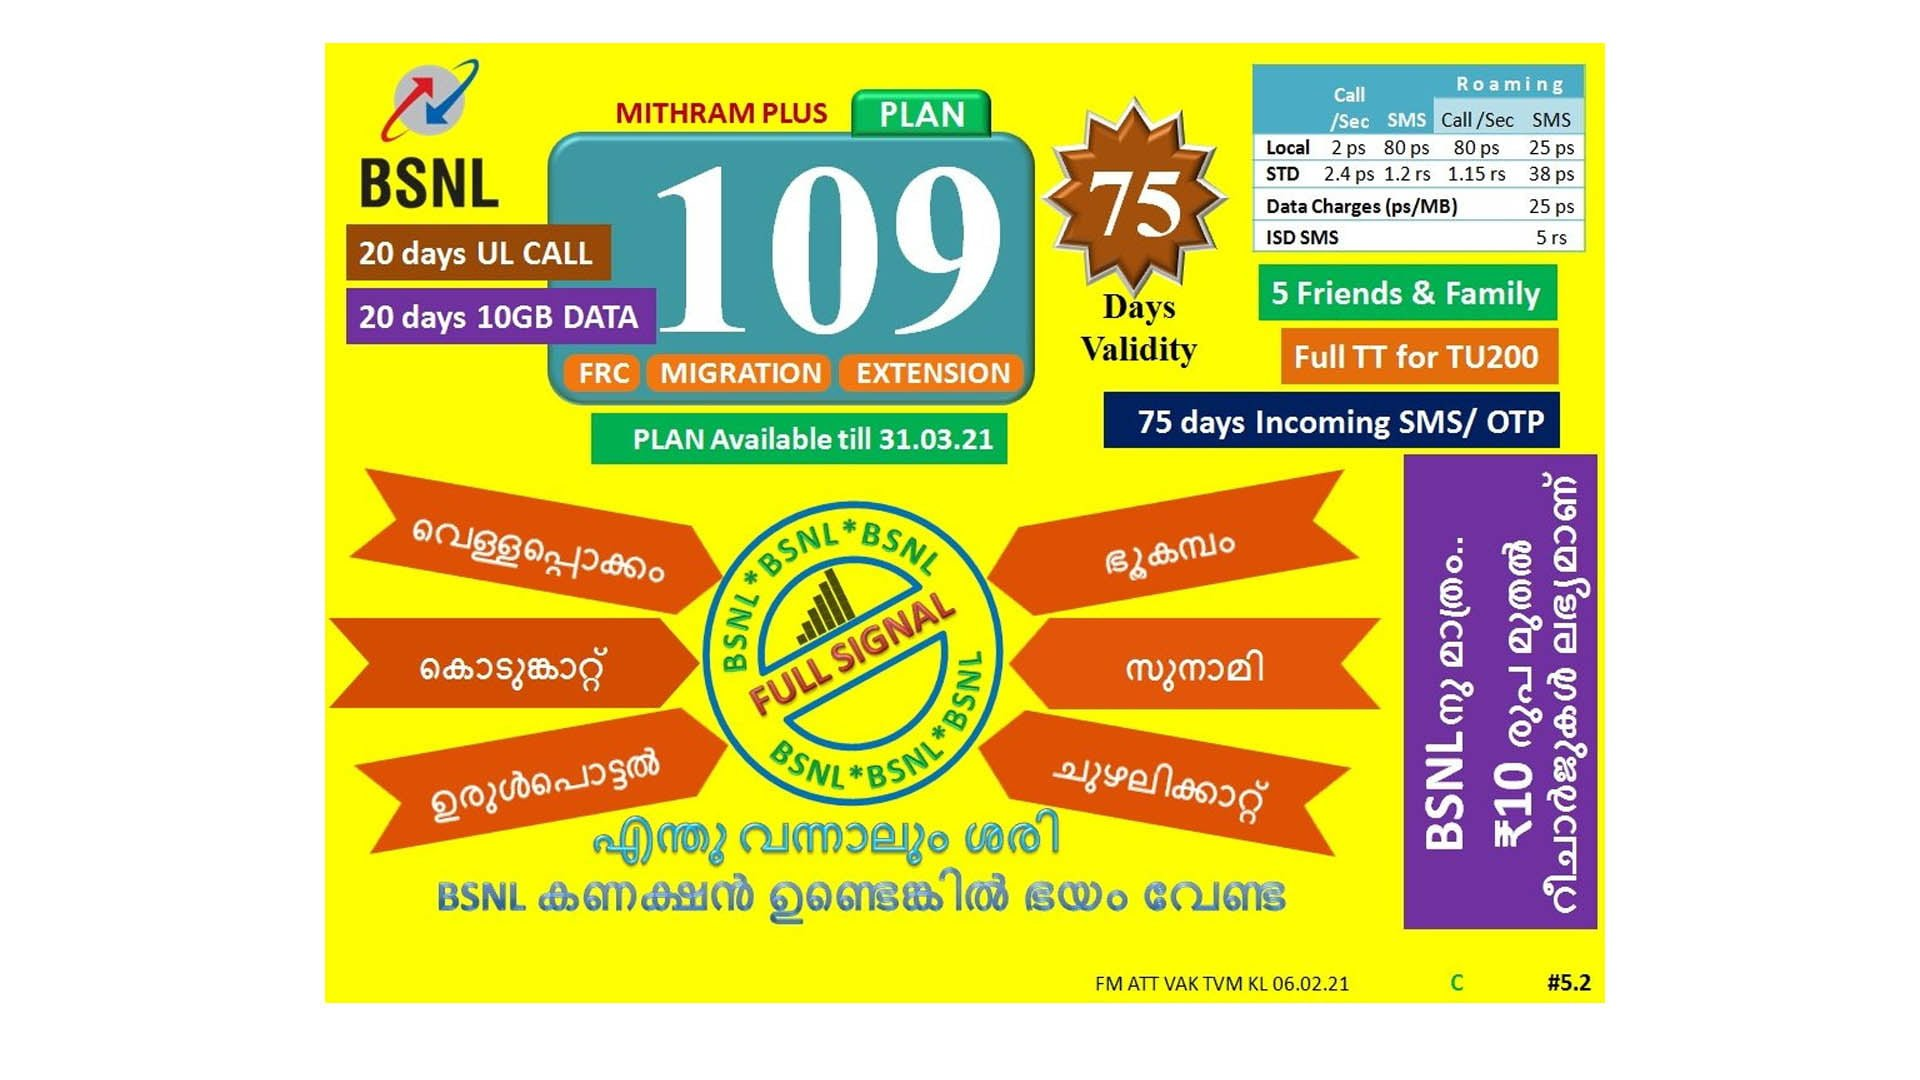 BSNL Rs 109 Mithram Plus